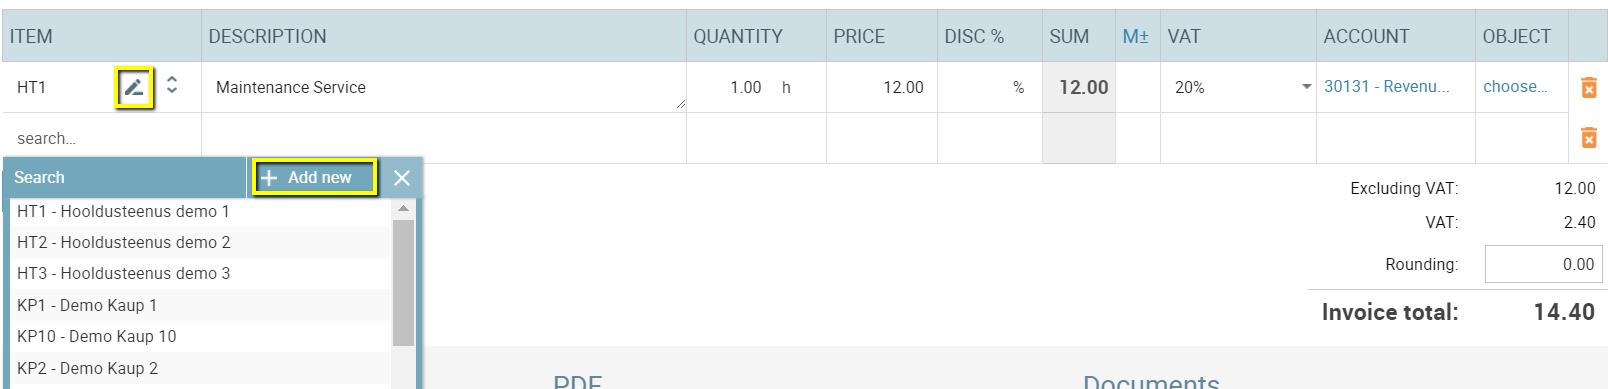 sales invoice rows